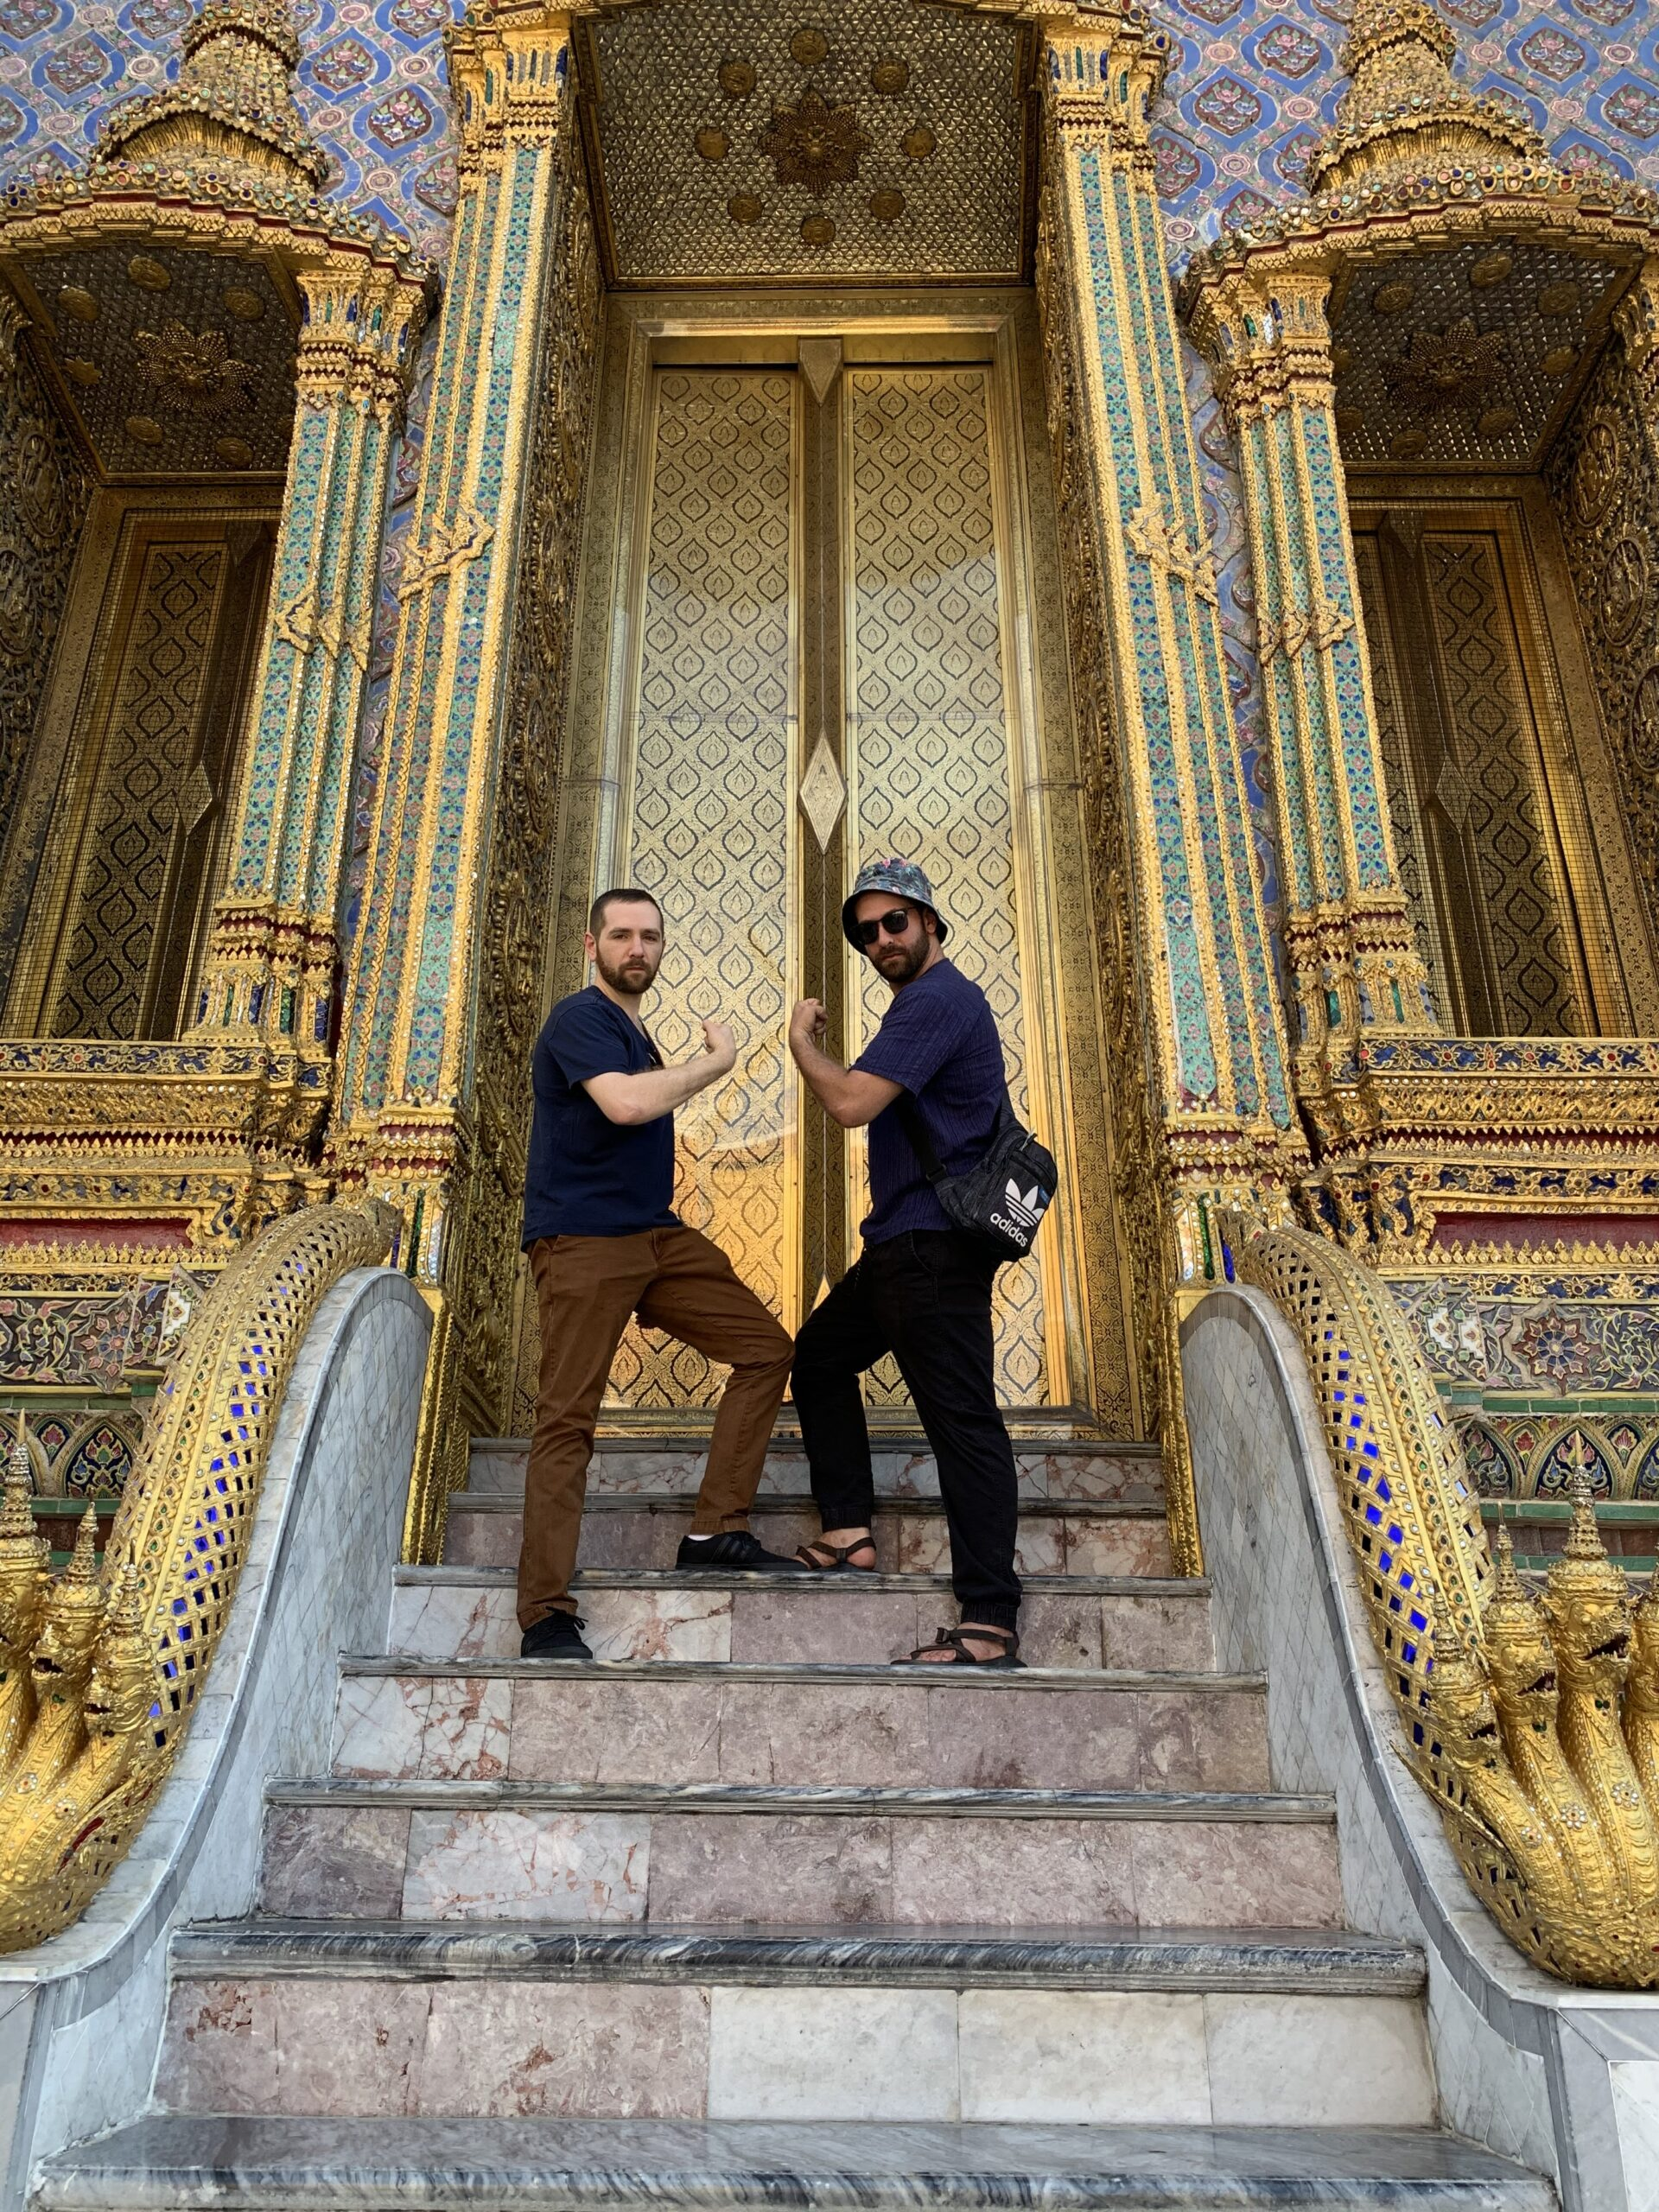 Ian Pickus and Neil Pickus in Bangkok in early 2020.